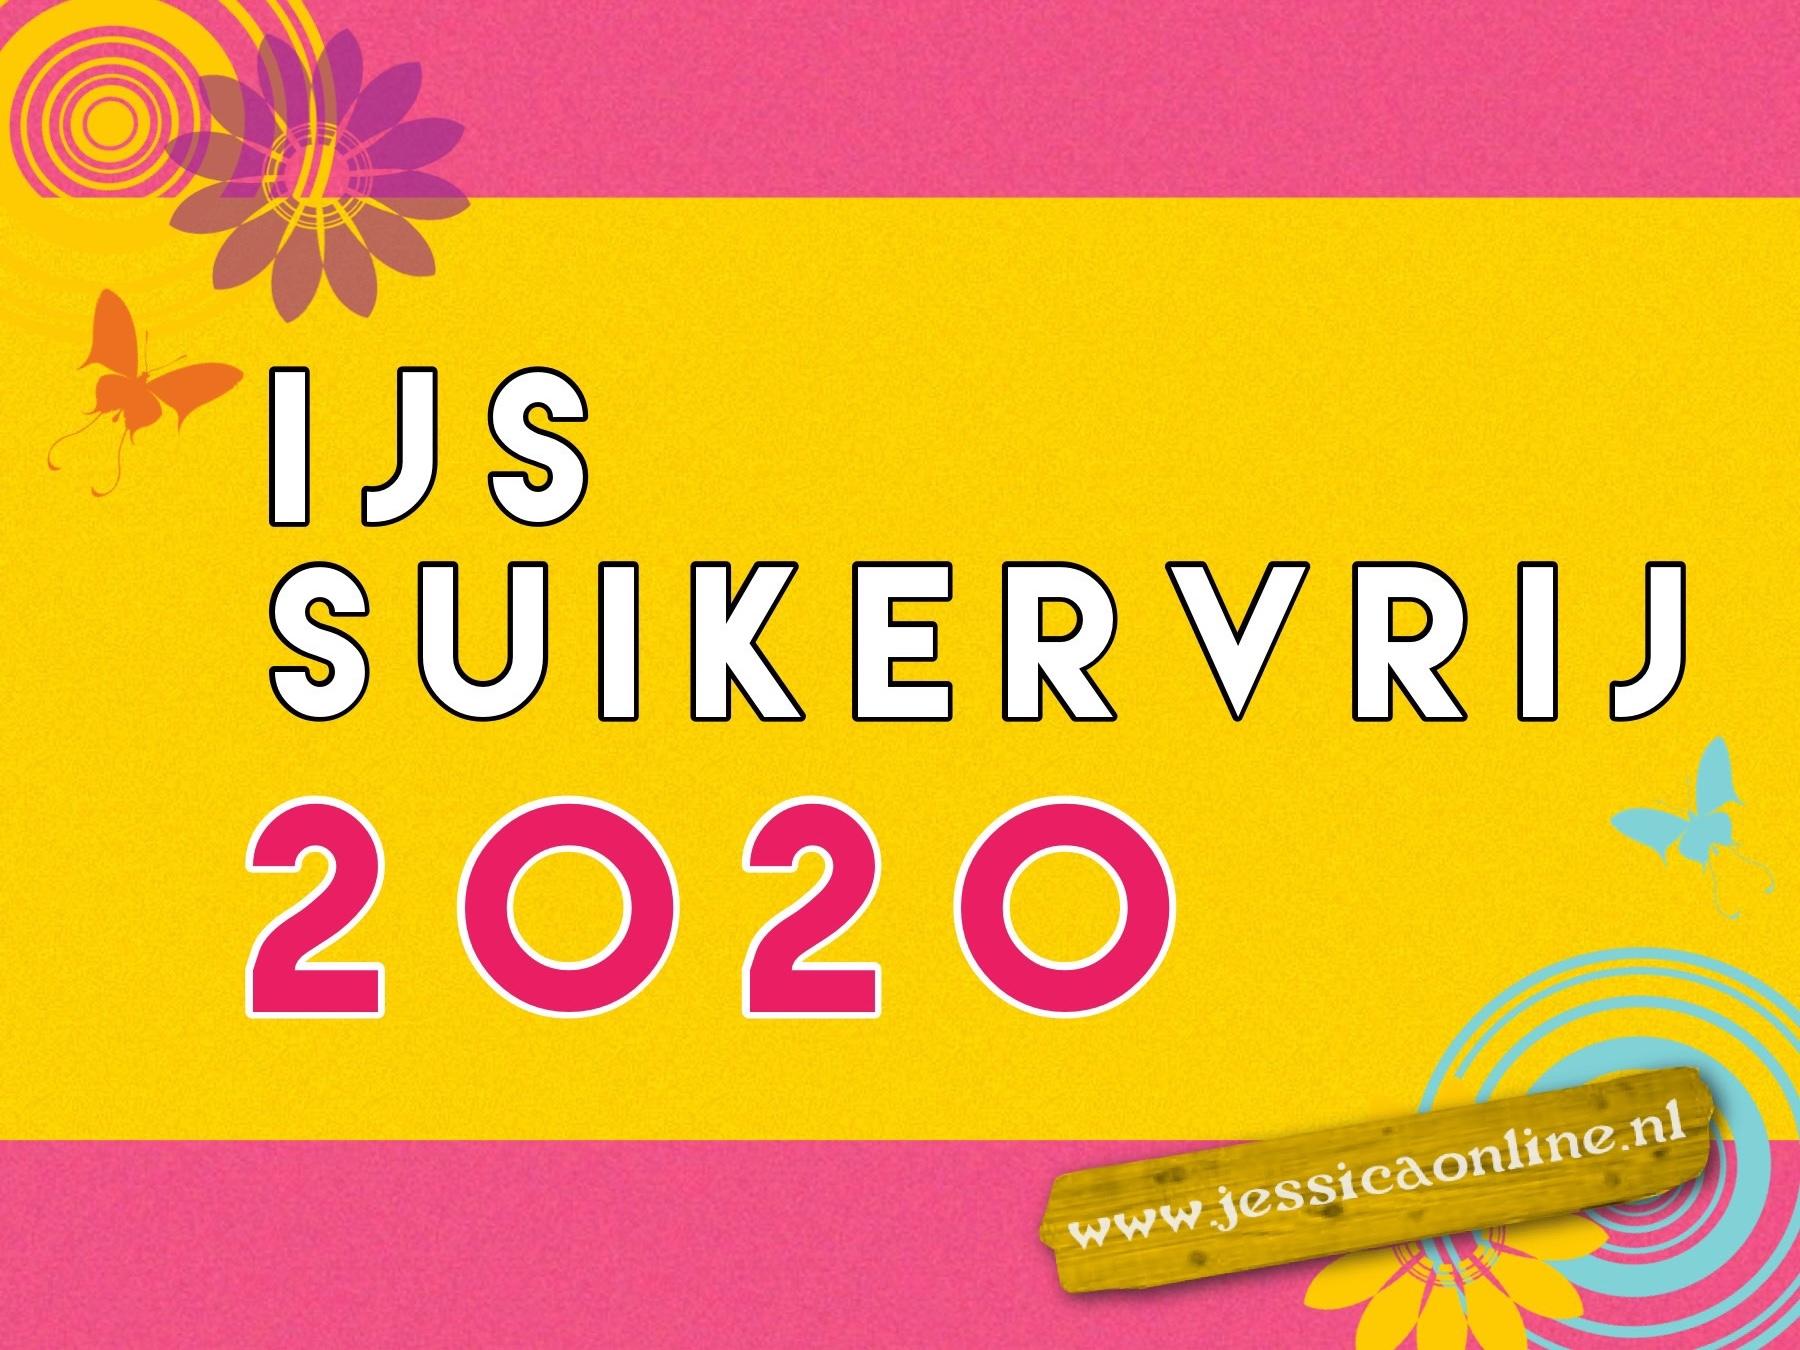 ijssukervrij2020 Missie JessicaOnline.nl